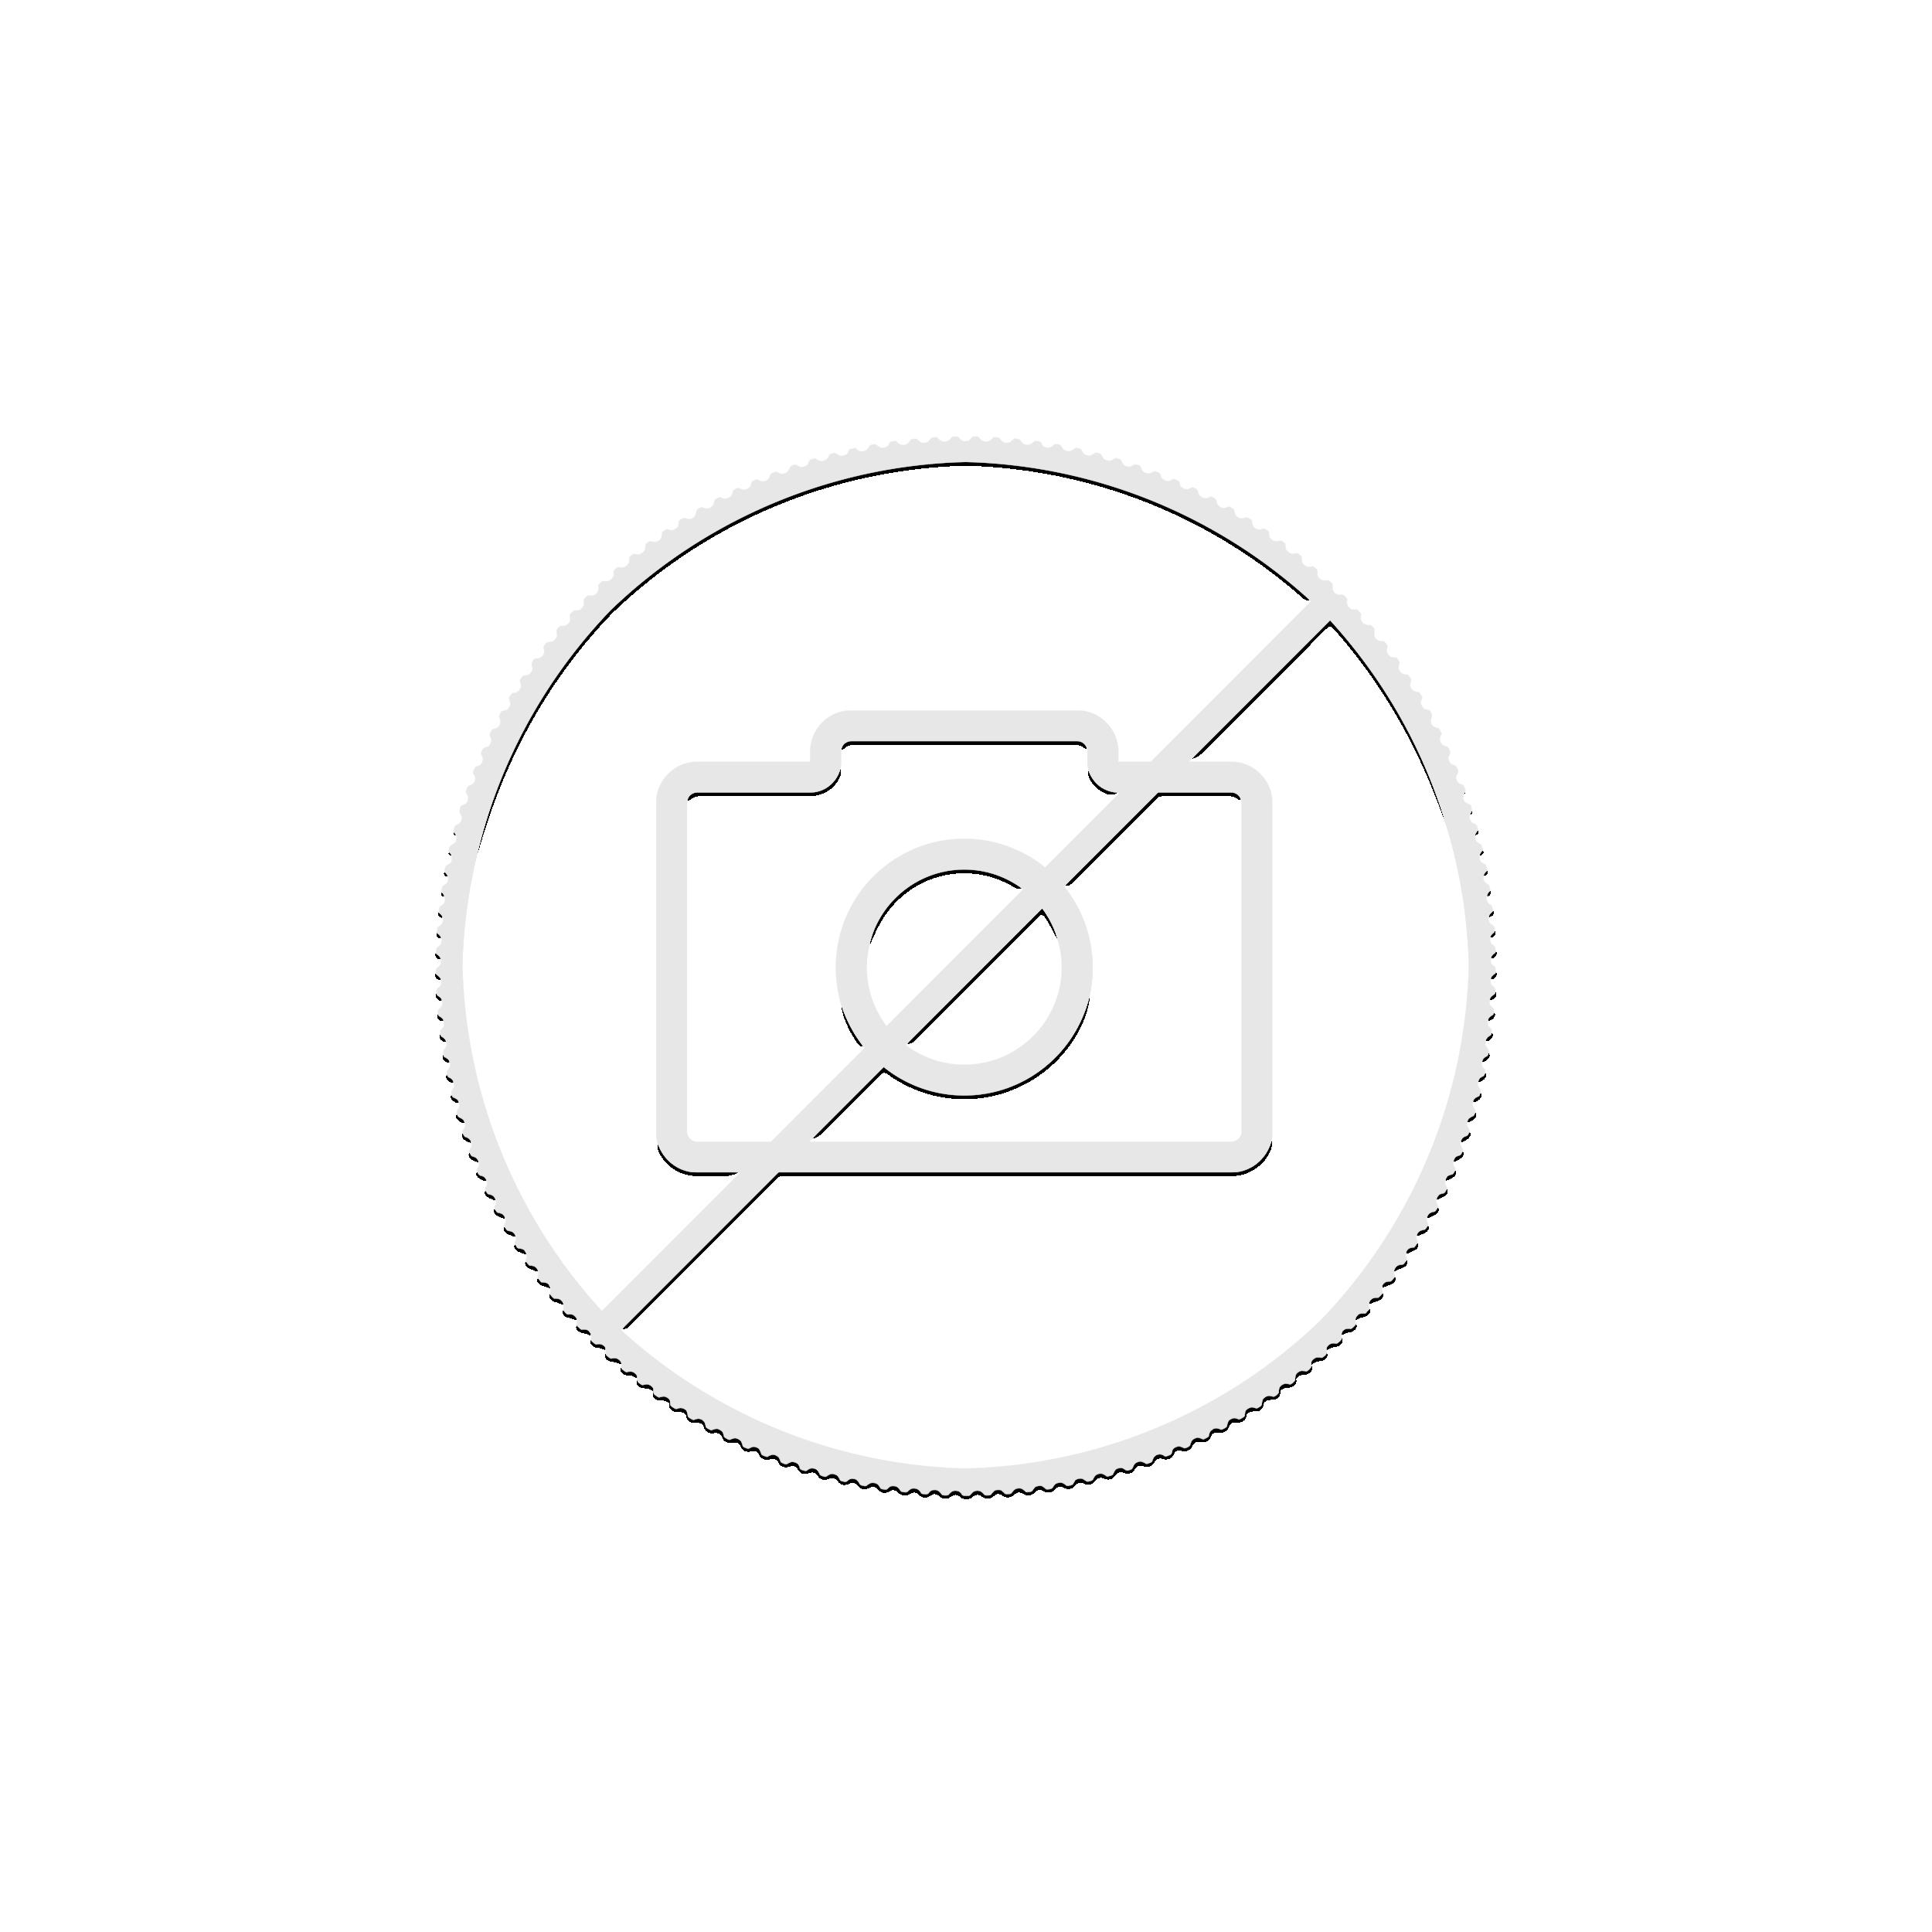 1 4 oz American Eagle front